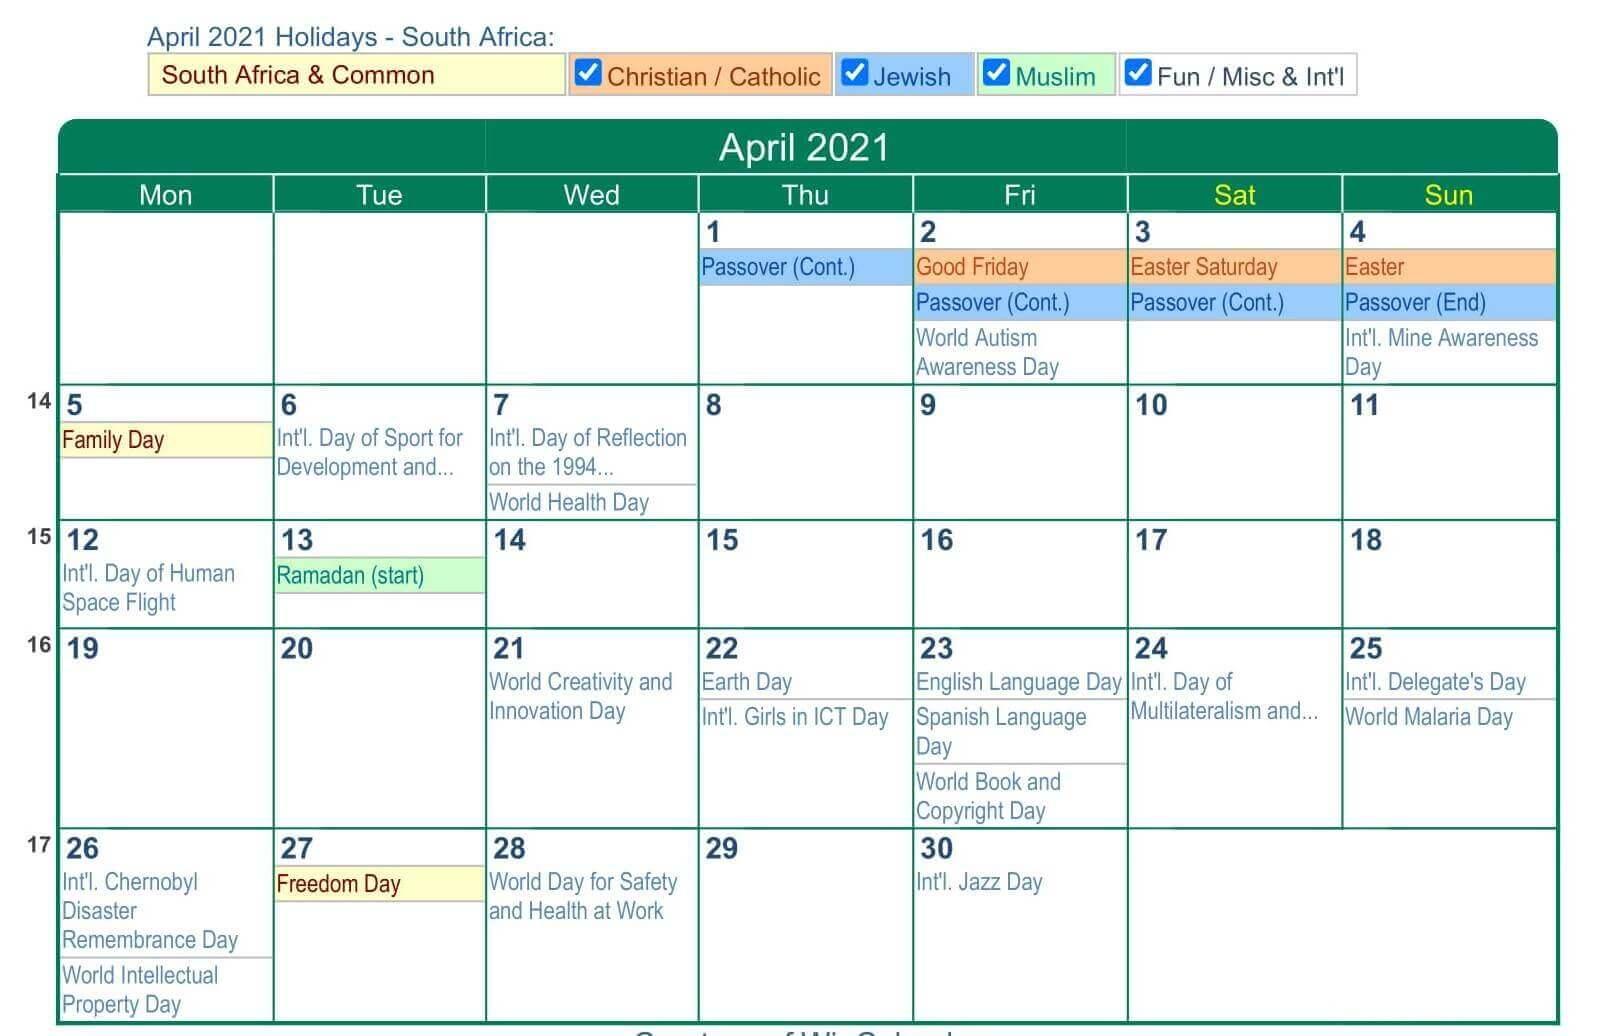 April 2021 South Africa Holidays Calendar